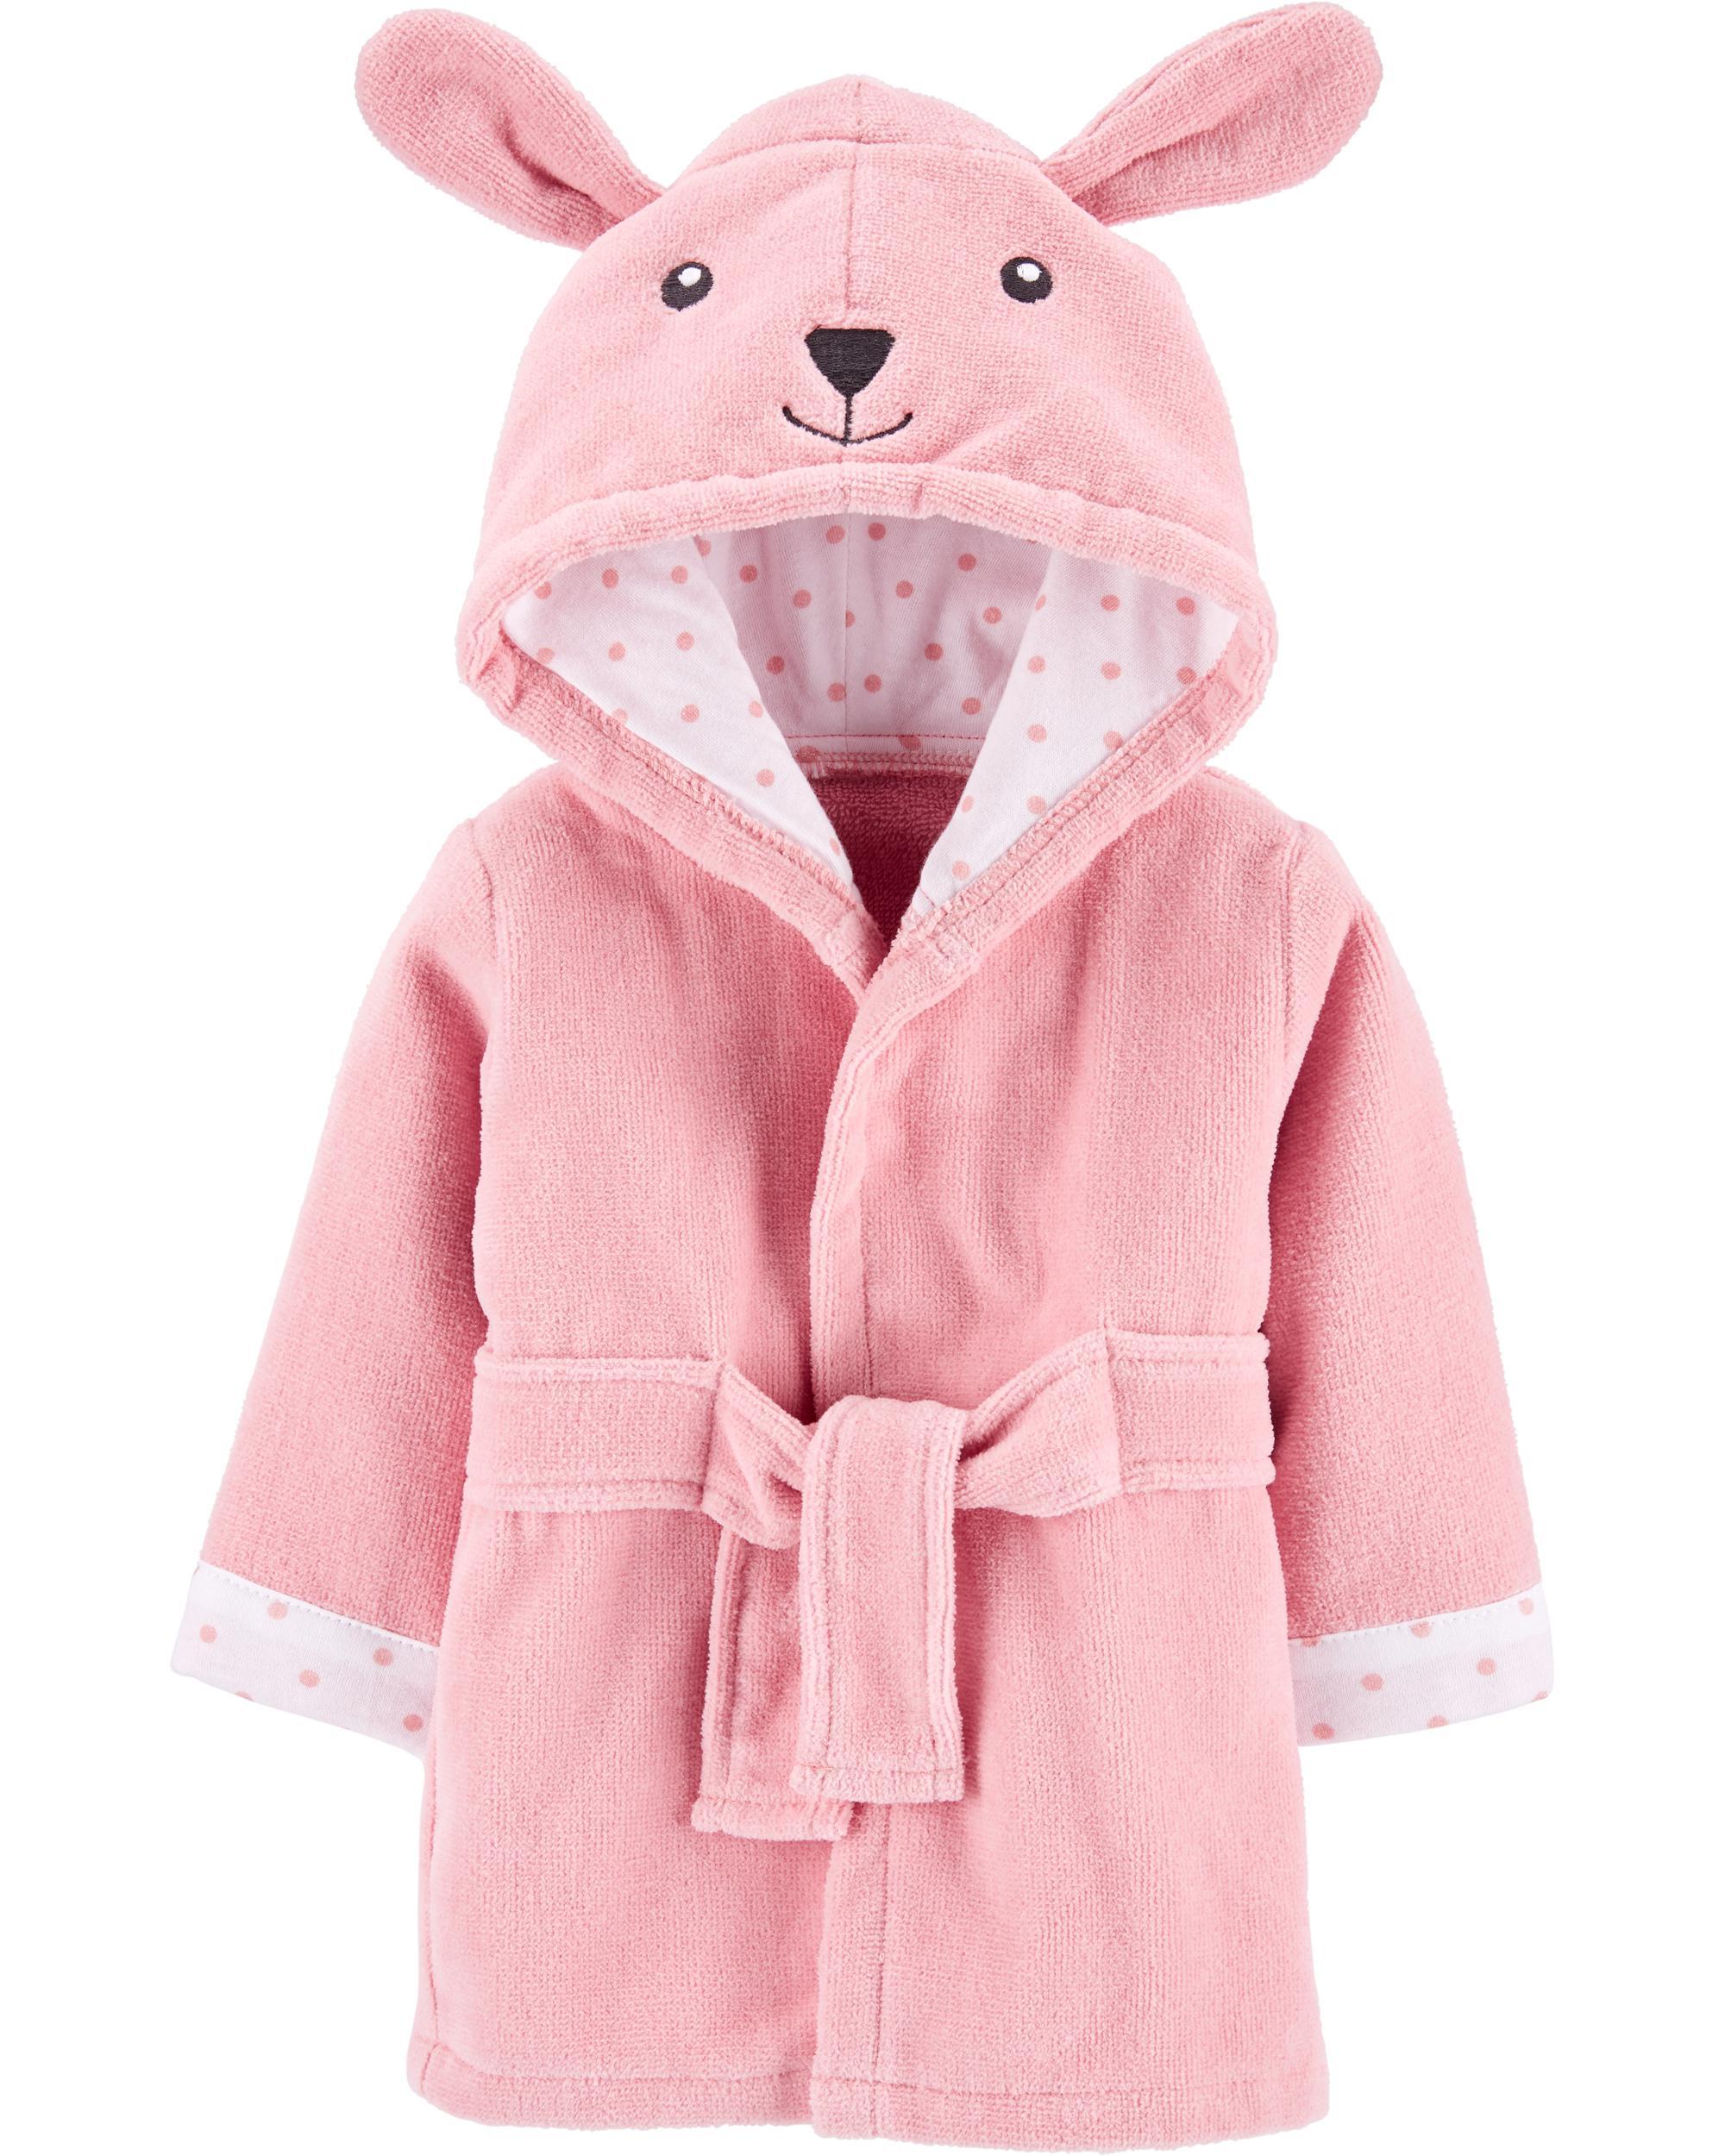 Carters Bunny Hooded Bath Robe